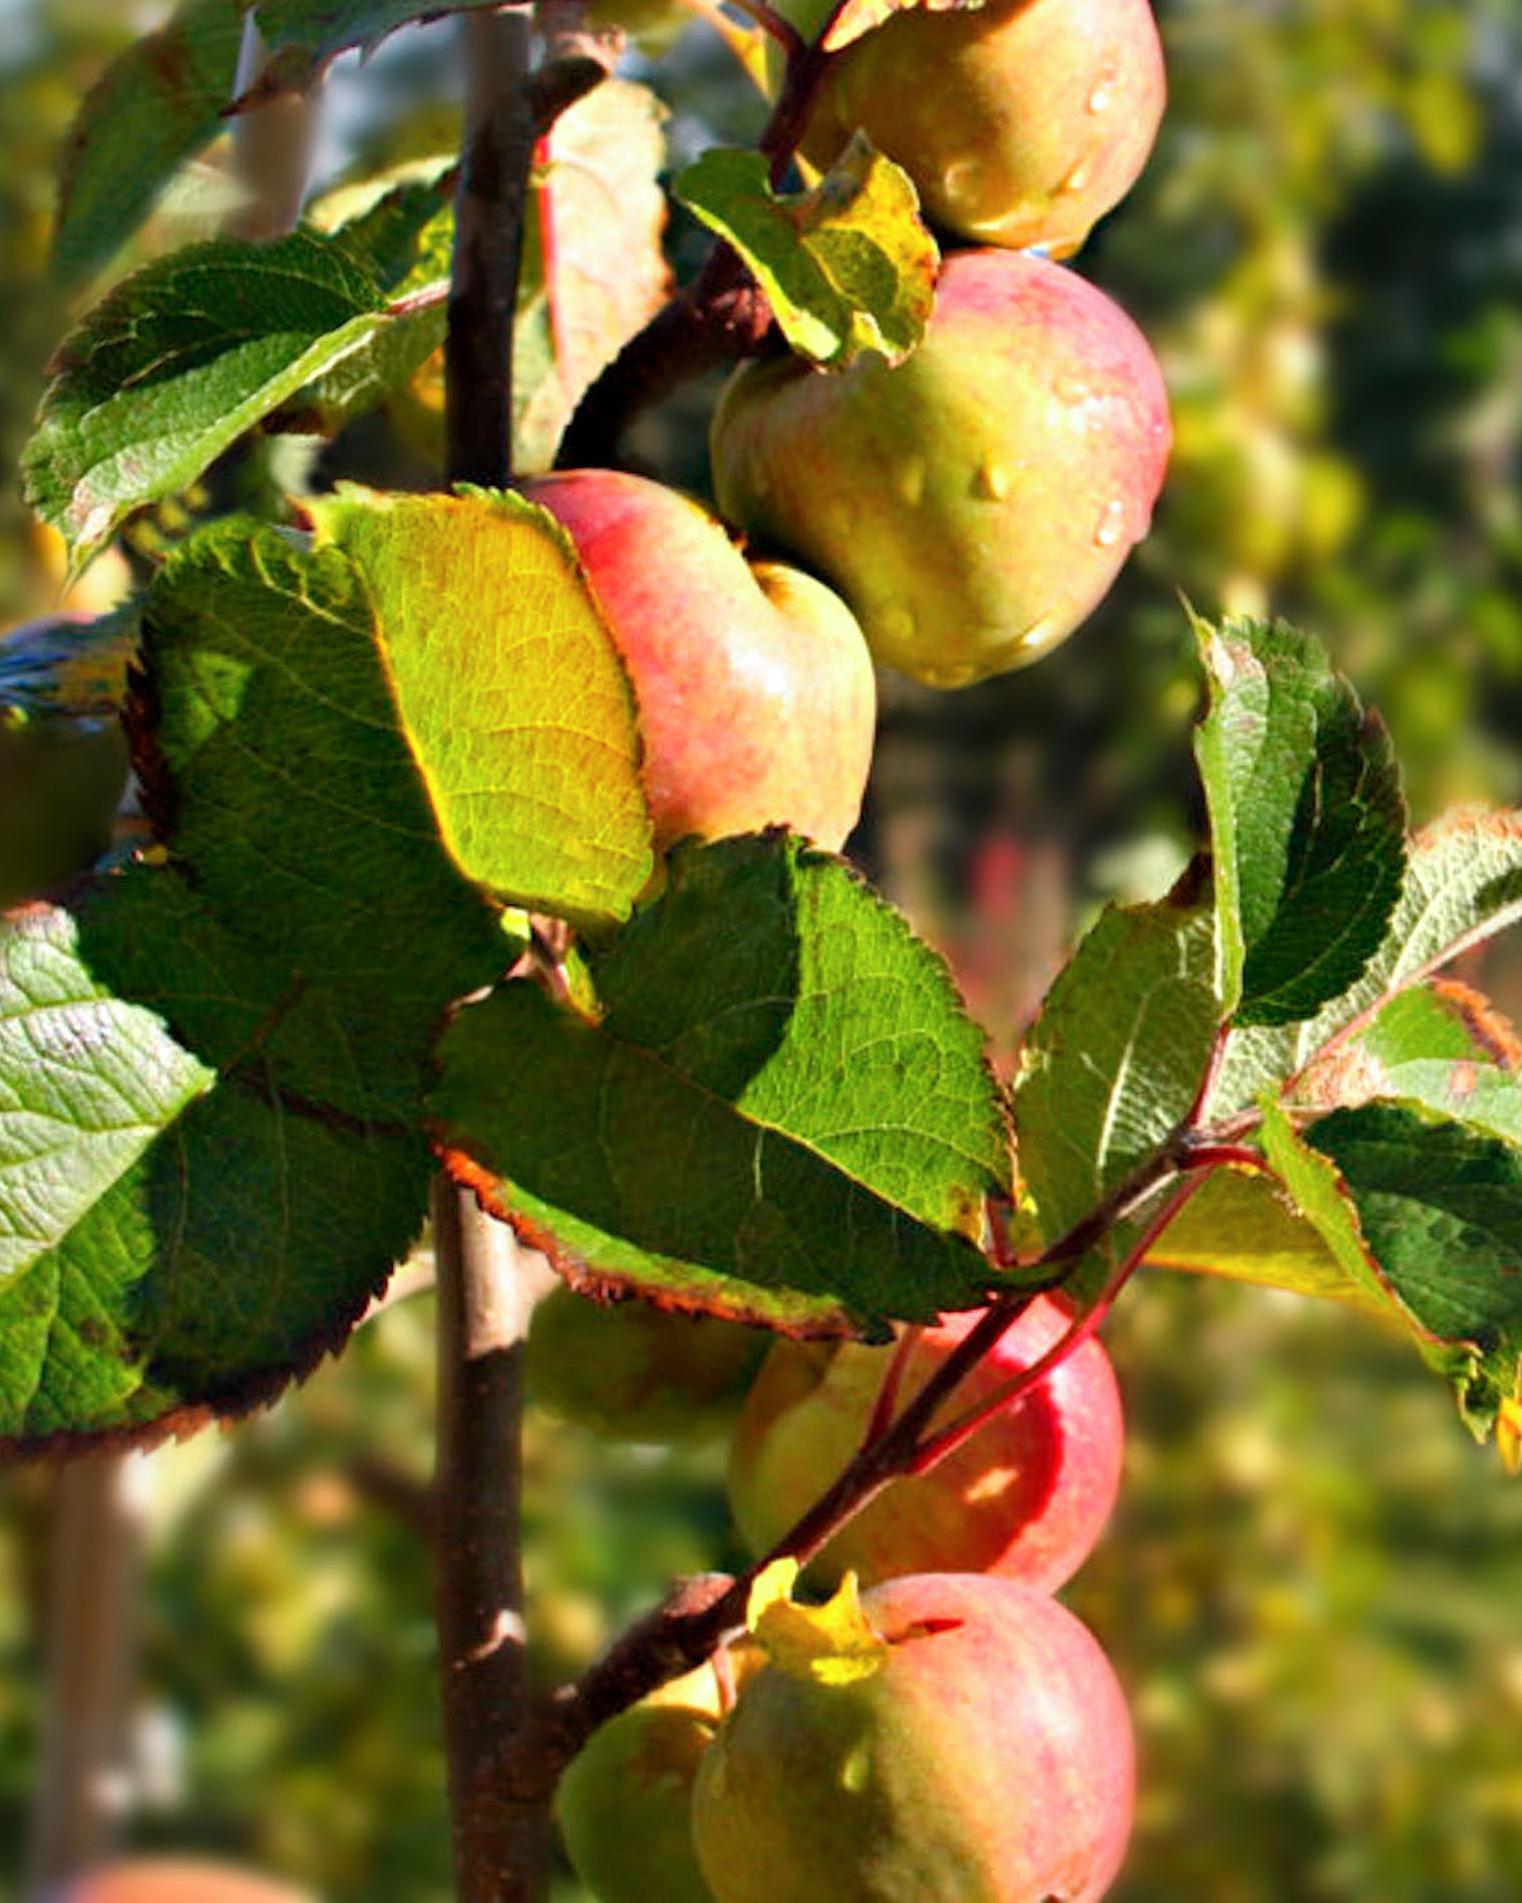 apples on orchard tree